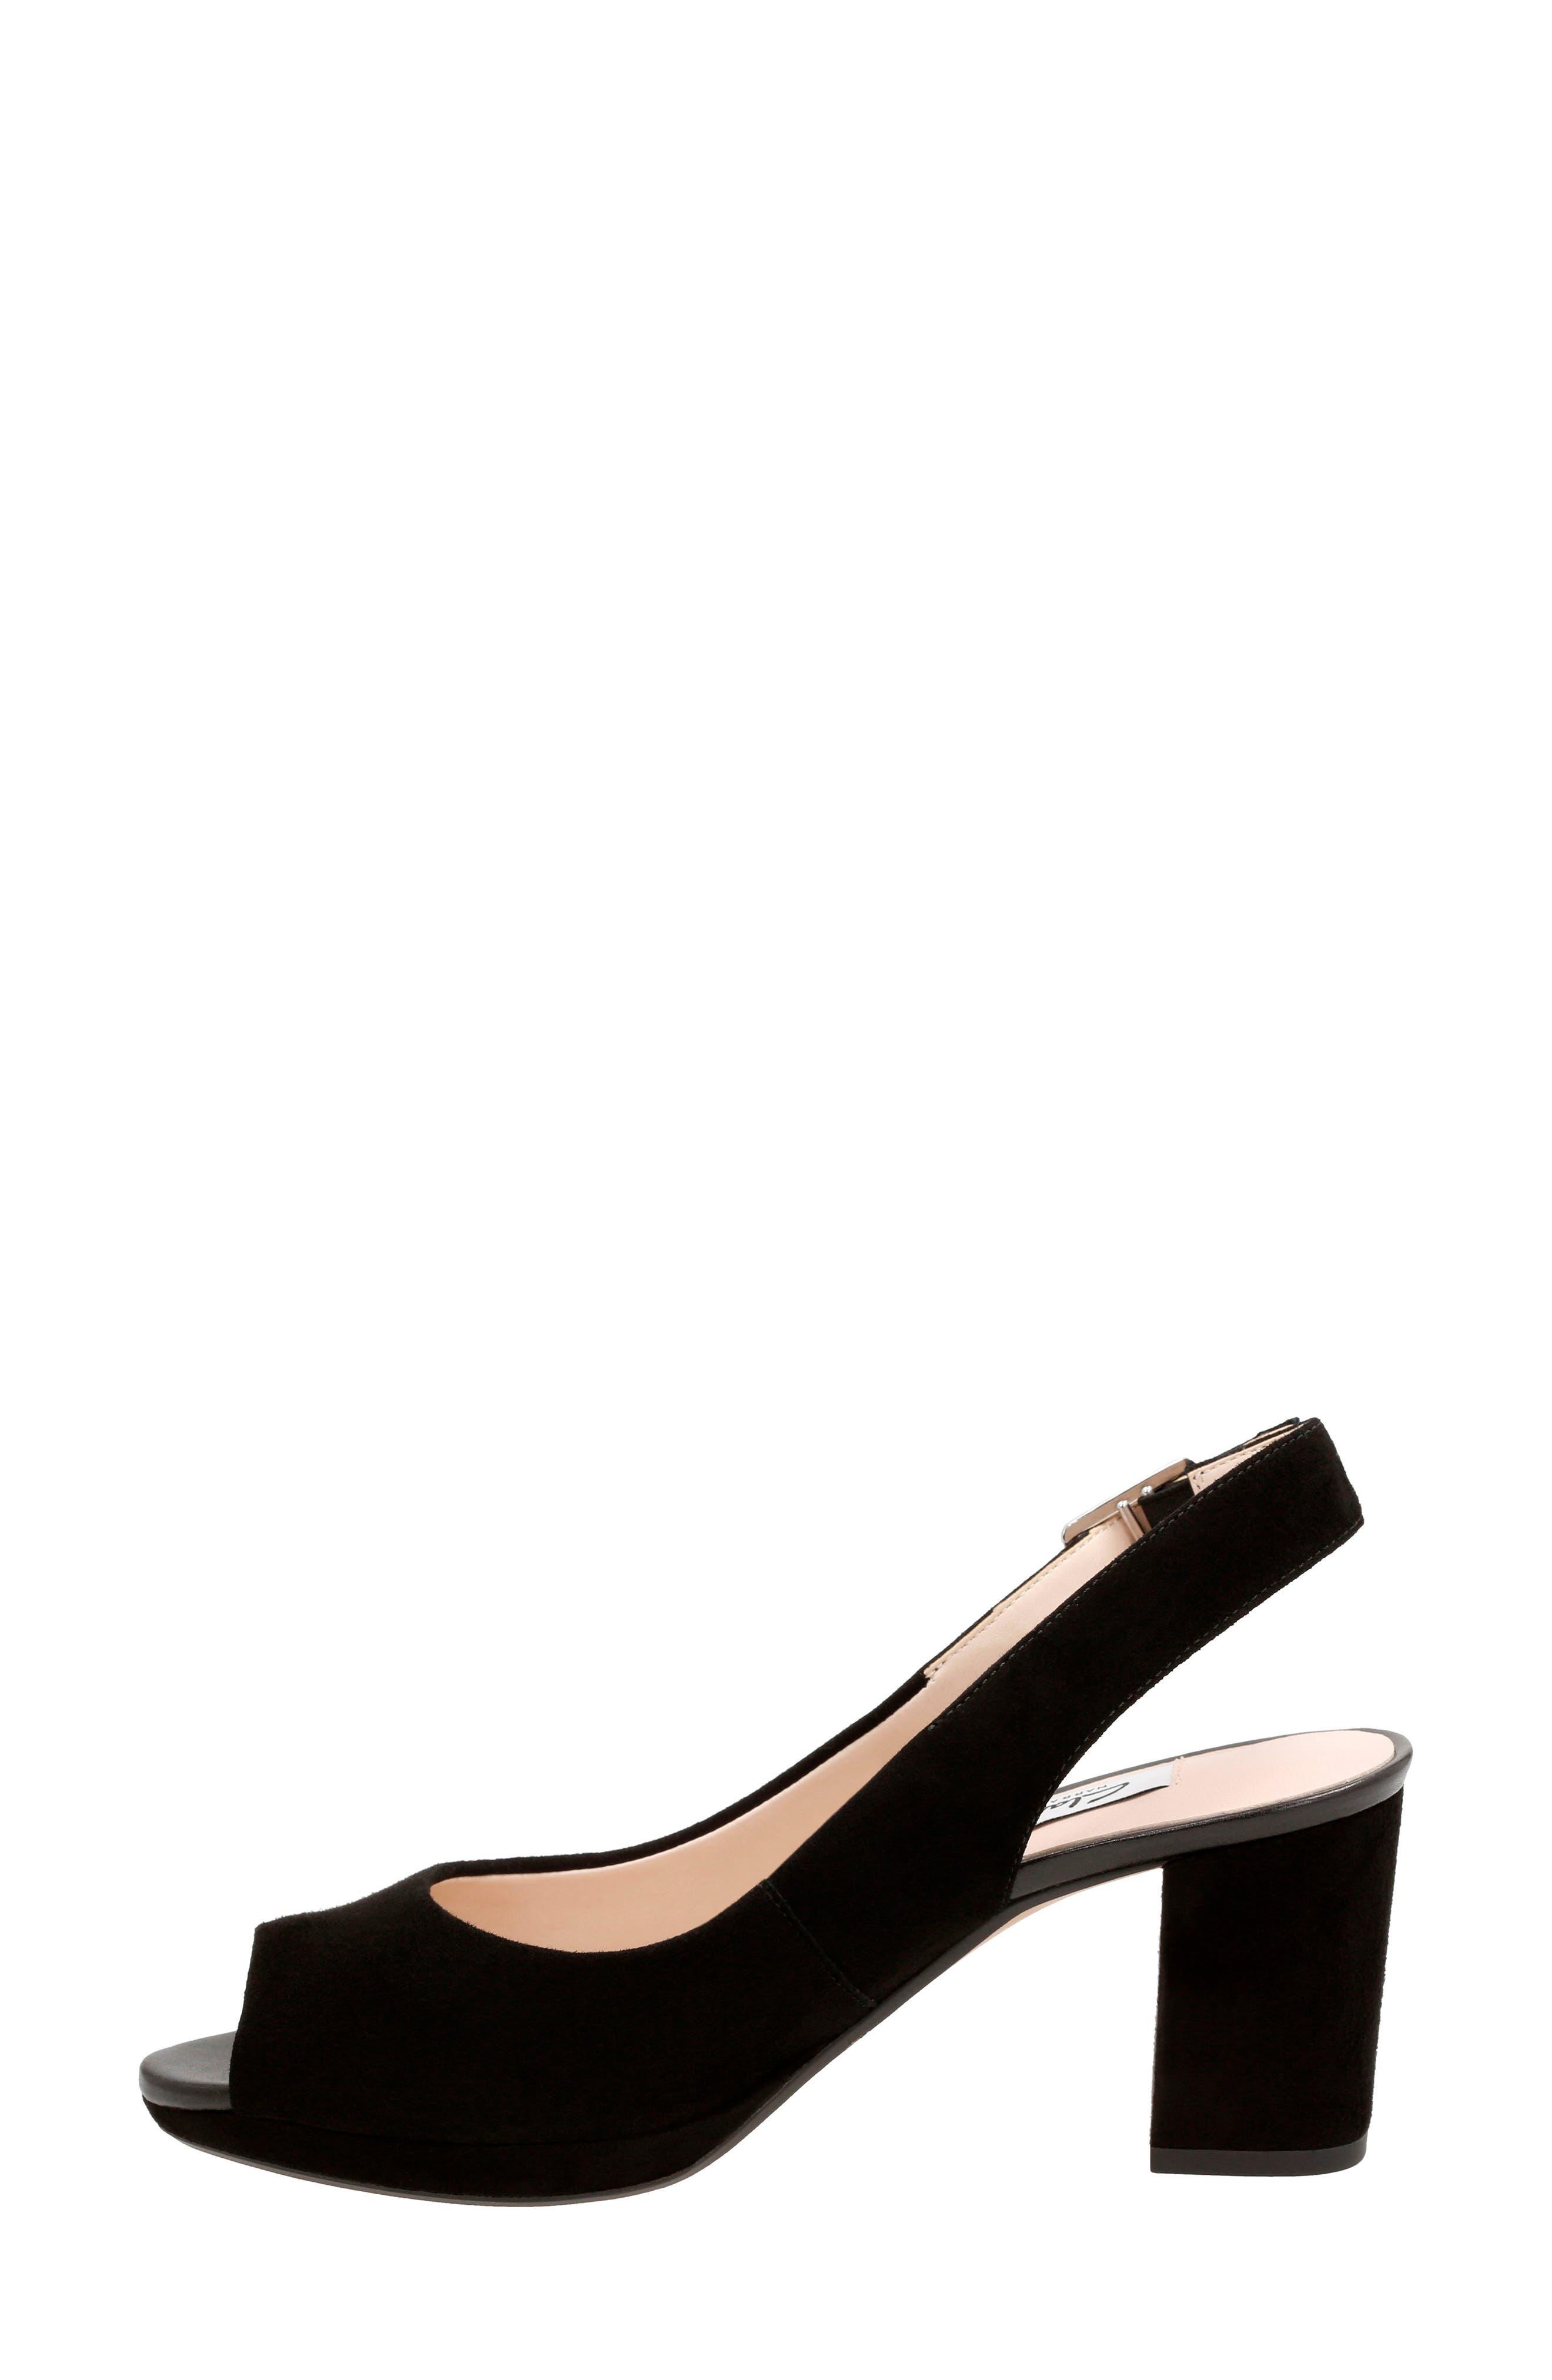 Kelda Slingback Sandal,                             Alternate thumbnail 2, color,                             007